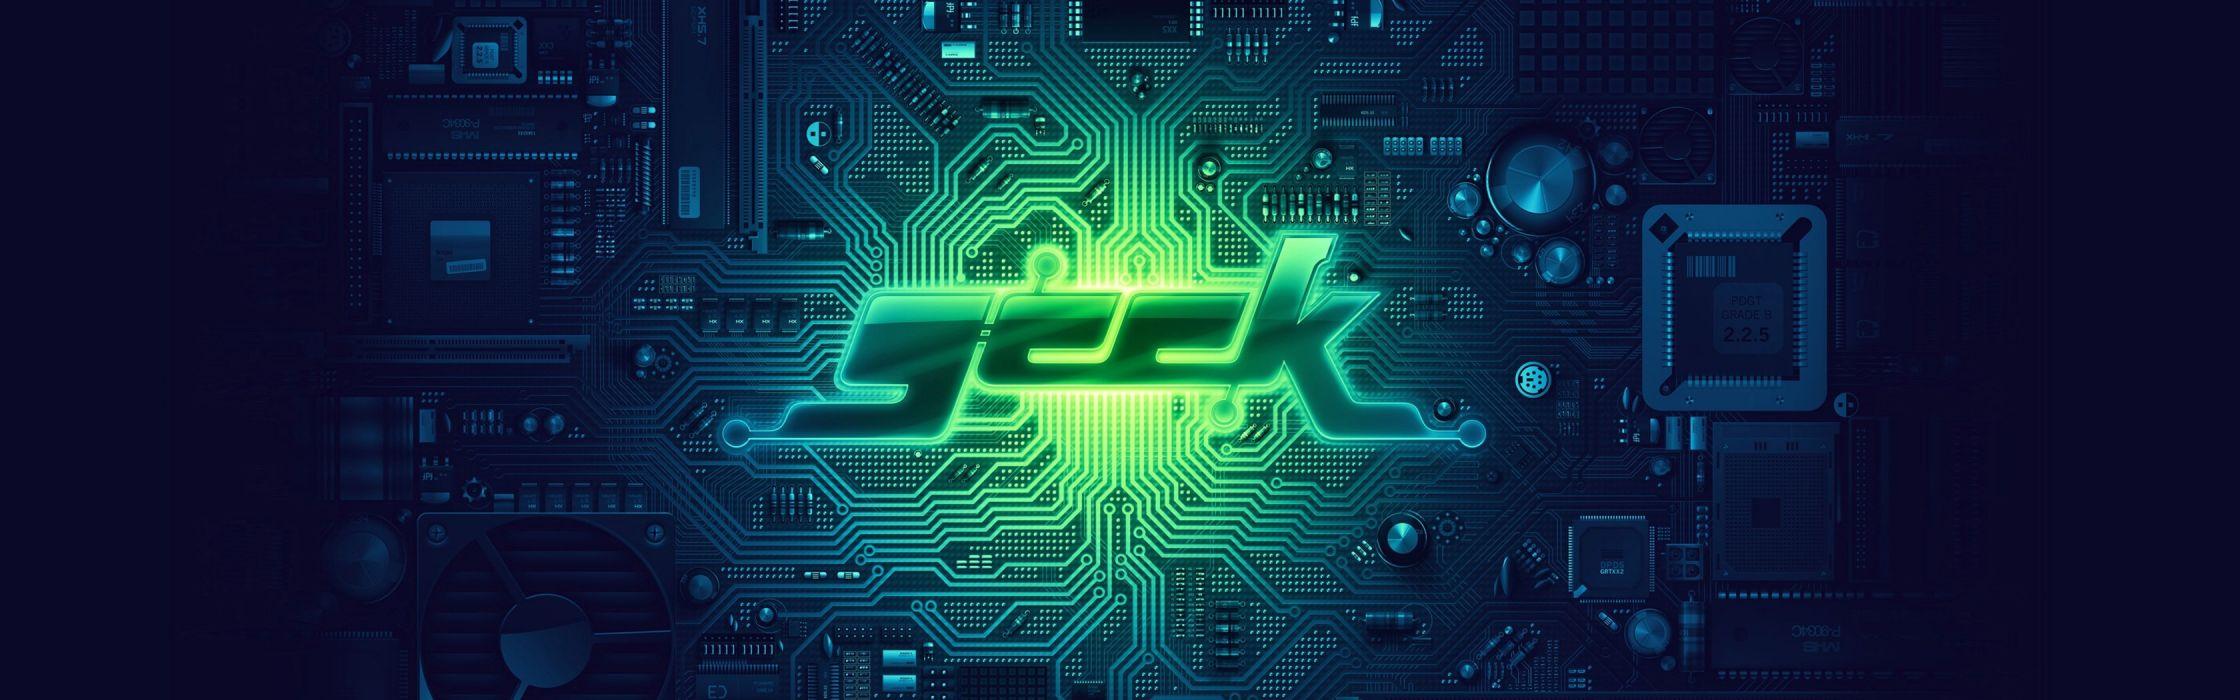 green blue geek PCB motherboards circuits Derek Prospero wallpaper